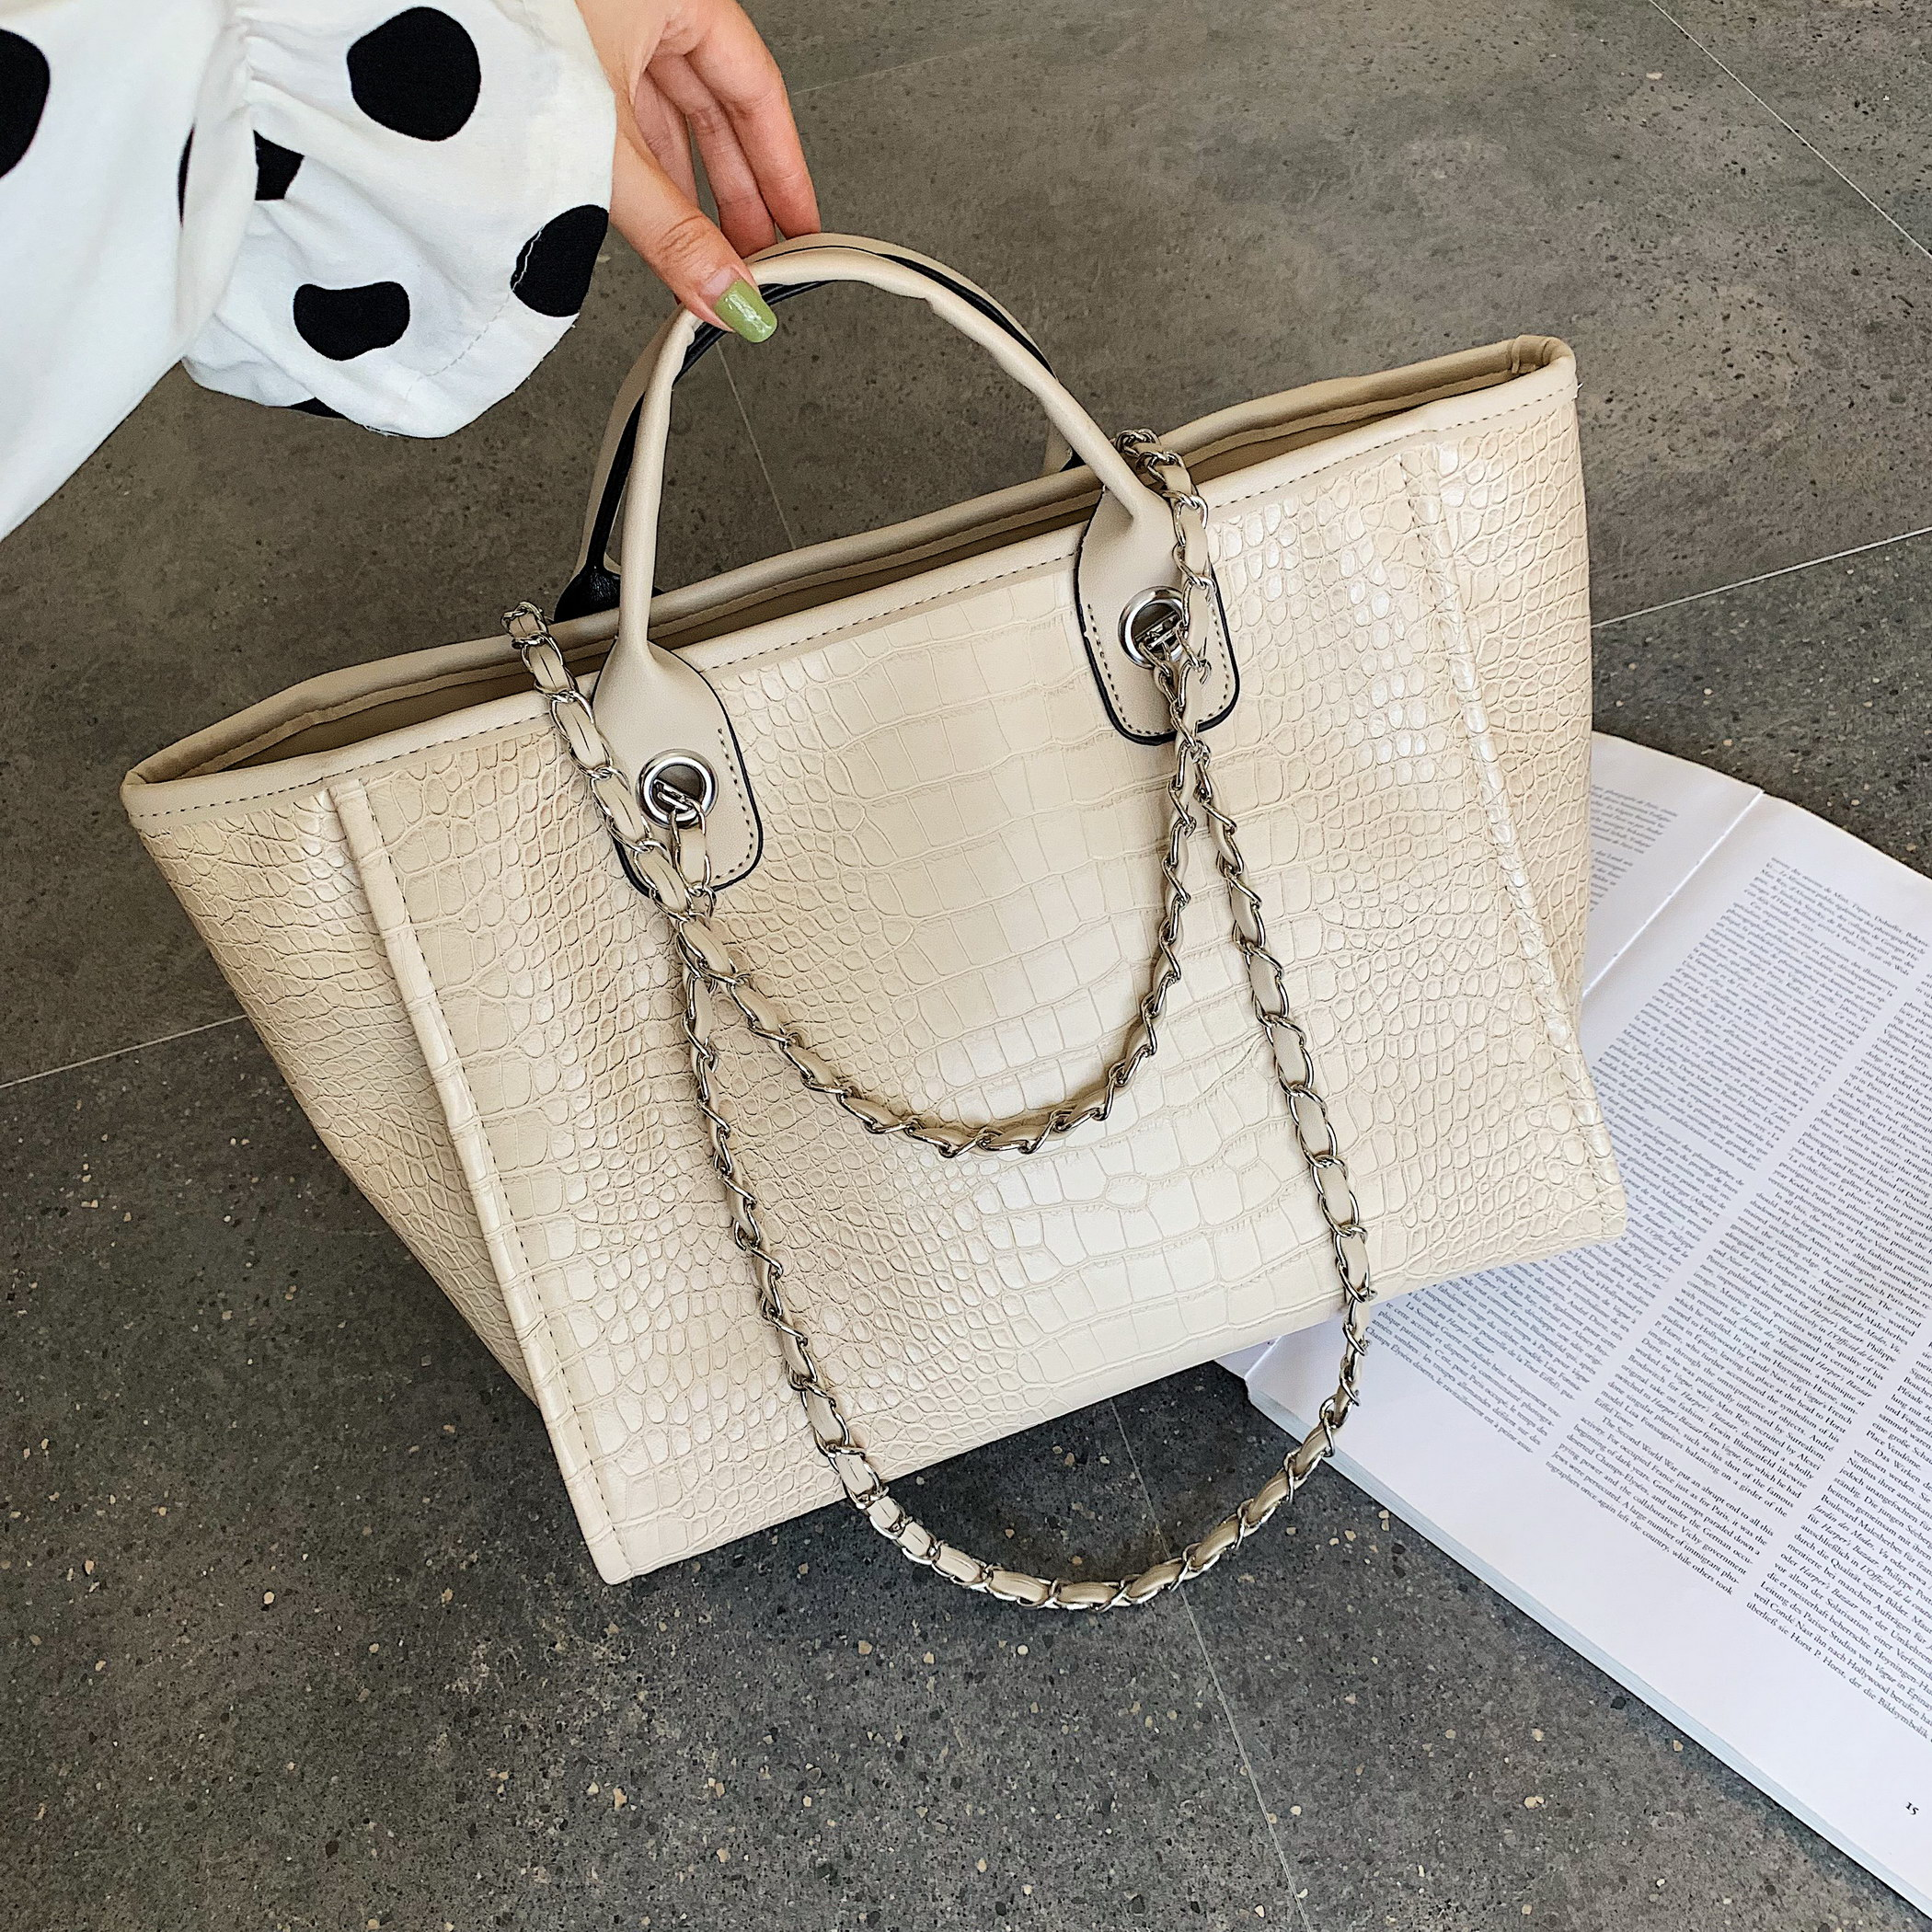 2019 New fashion Leather Bag for Women Shoulder Bag Leather Handbags Crocodile Pattern Women s Large